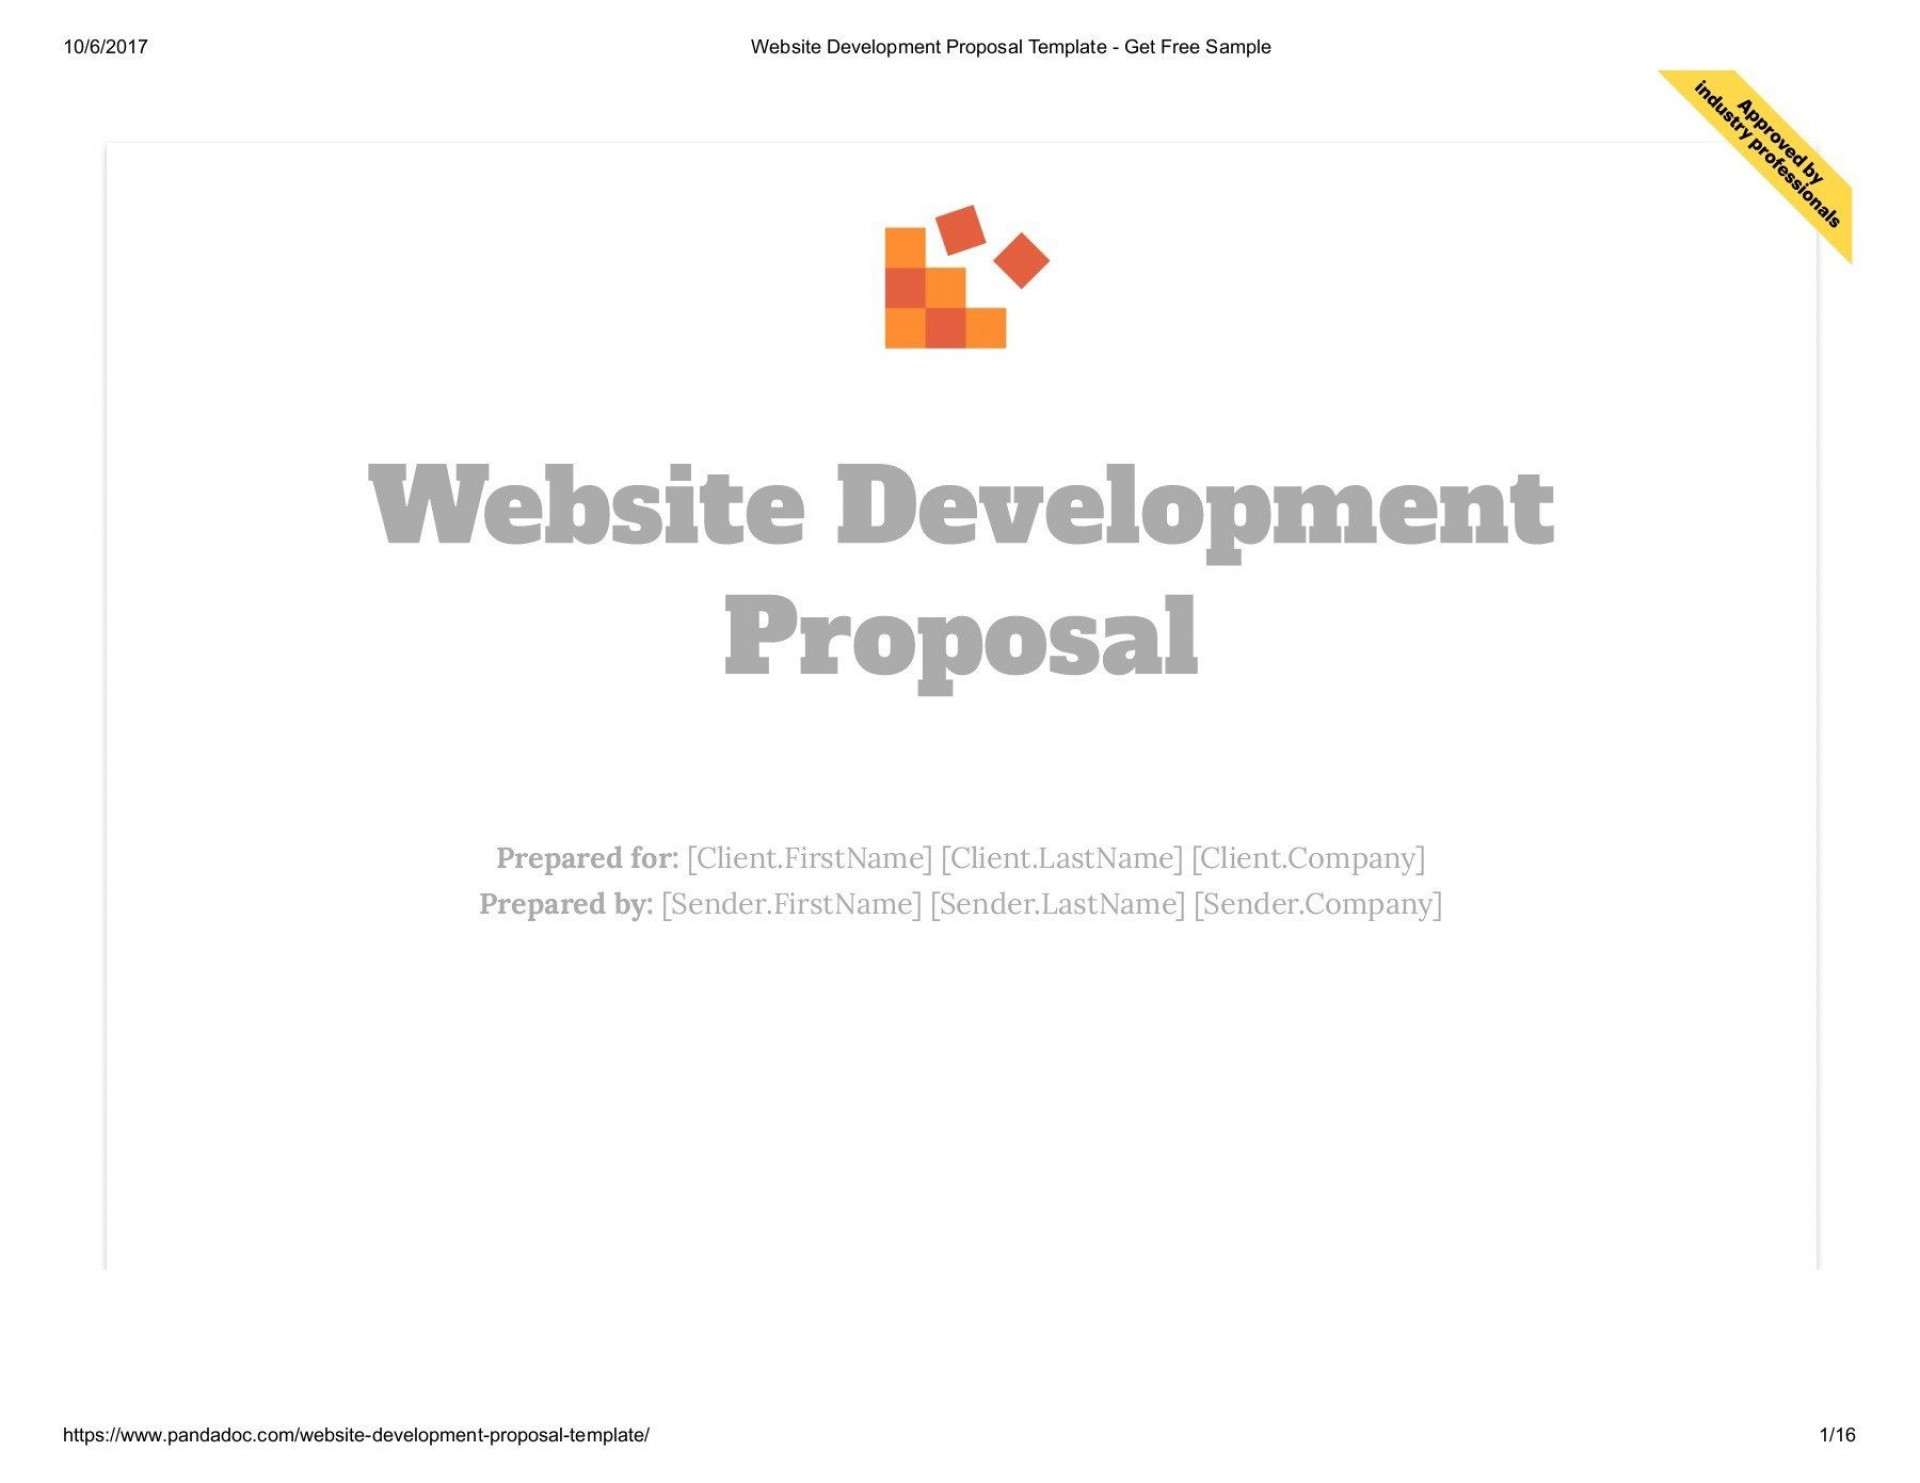 001 Surprising Website Development Proposal Template Free Example  Word1920